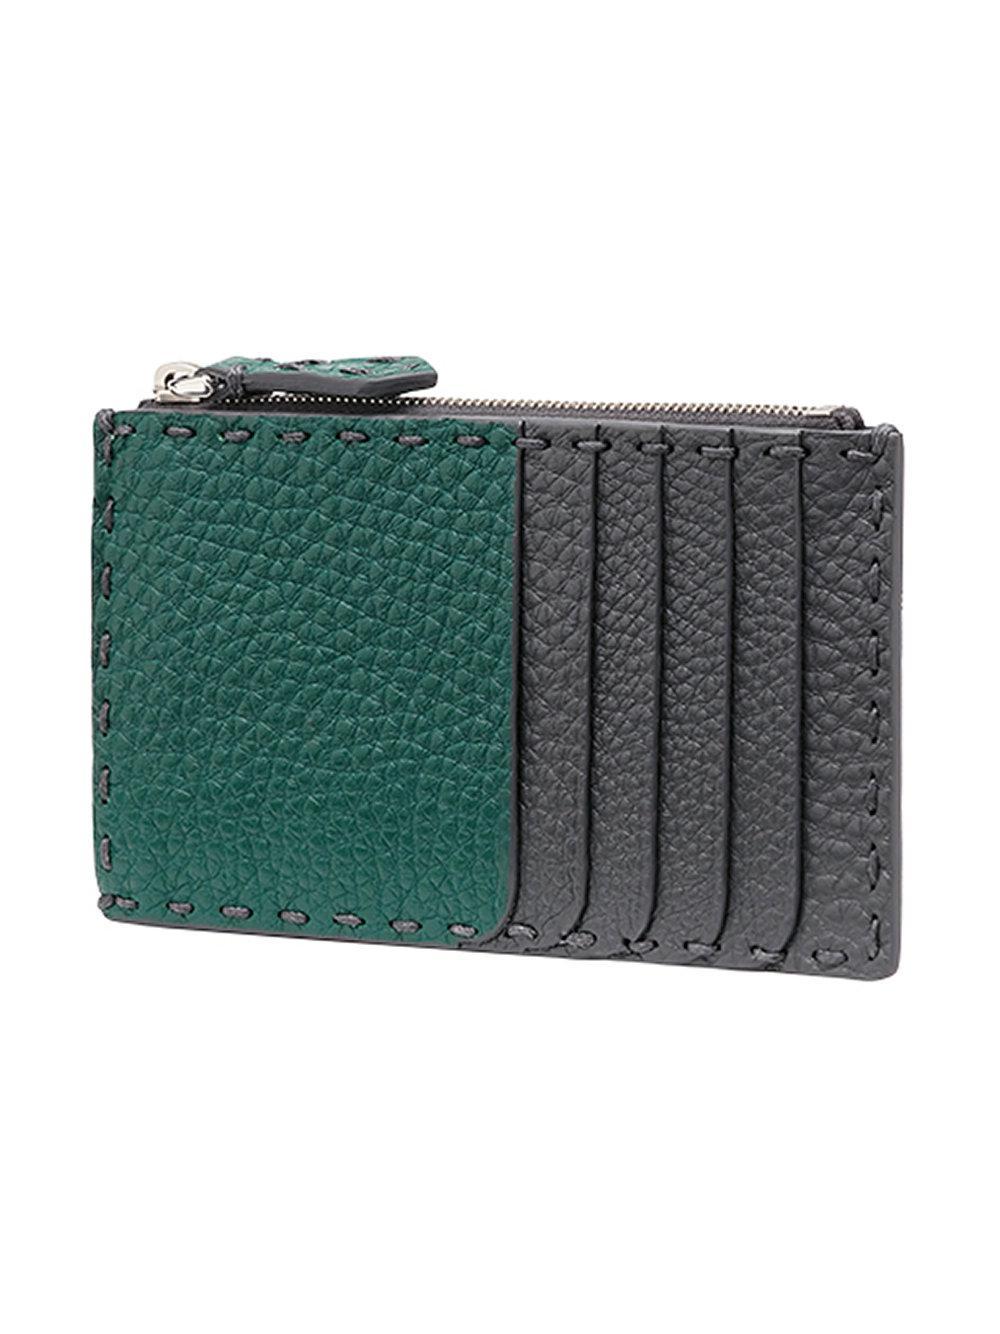 4ca636a87fb0 Lyst - Fendi Selleria Zipped Wallet in Gray for Men